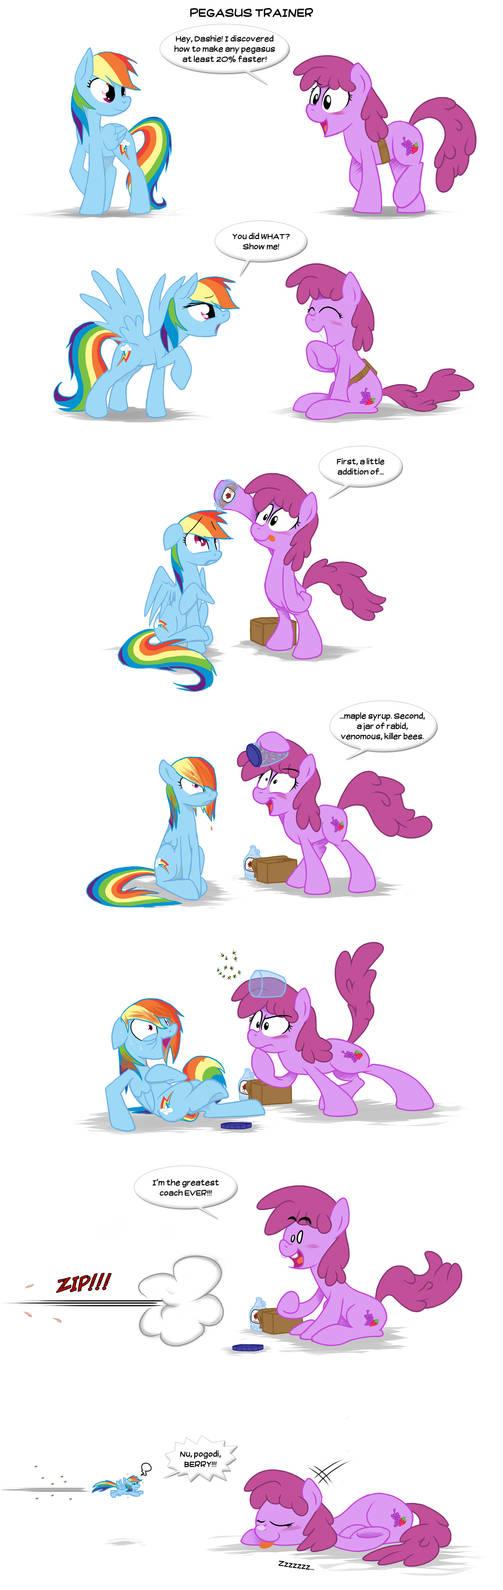 Pegasus trainer by Epulson